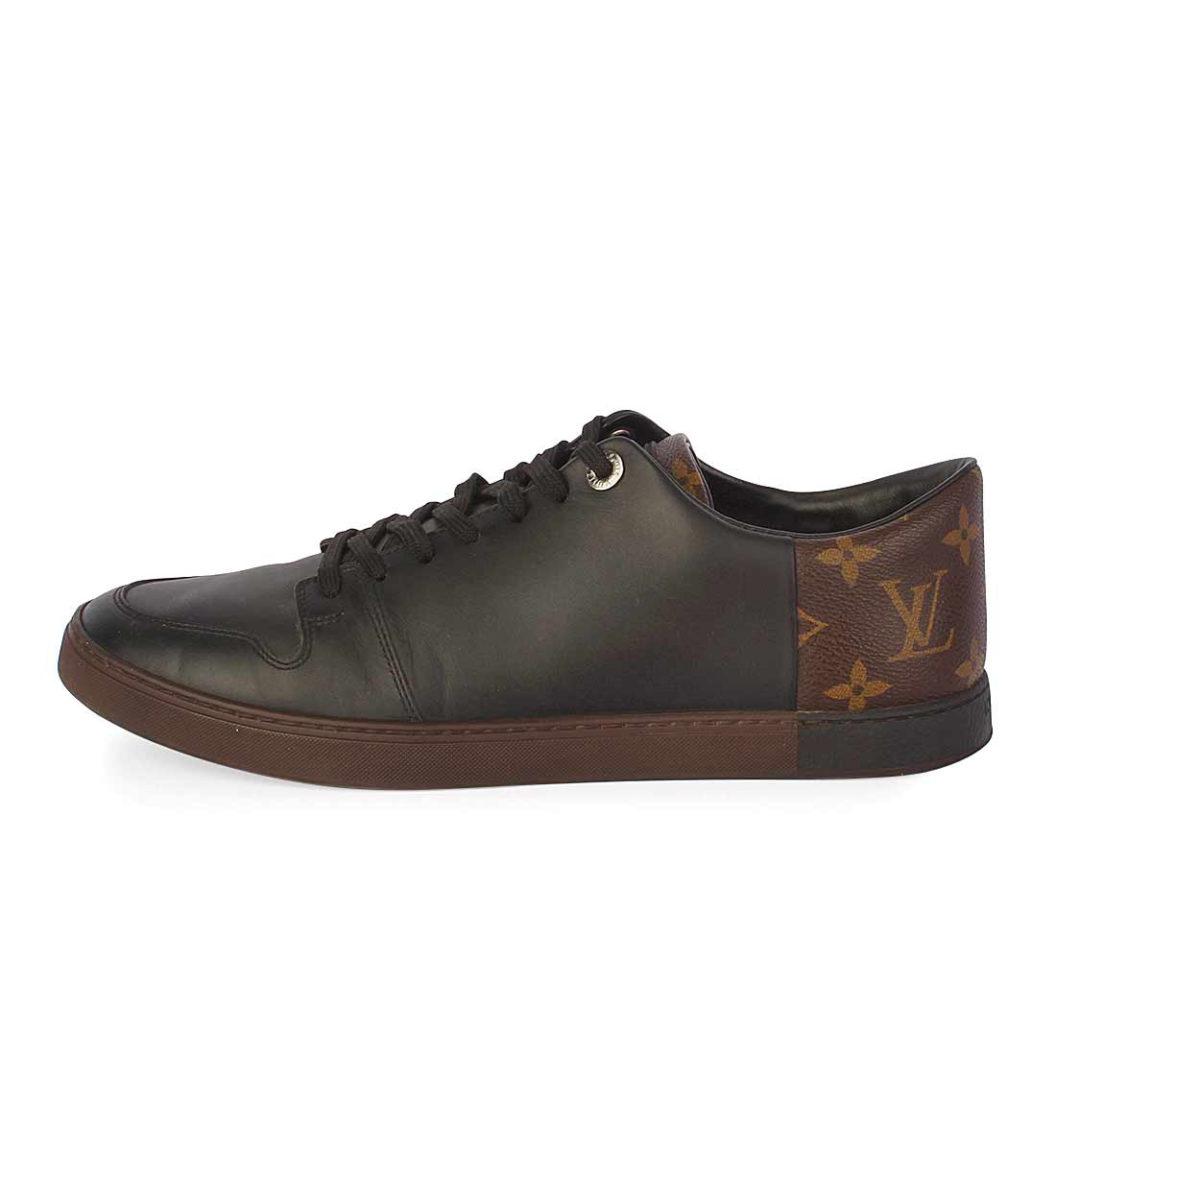 26a34e1623fe LOUIS VUITTON Monogram Line-Up Sneakers - S  40.5 (7)